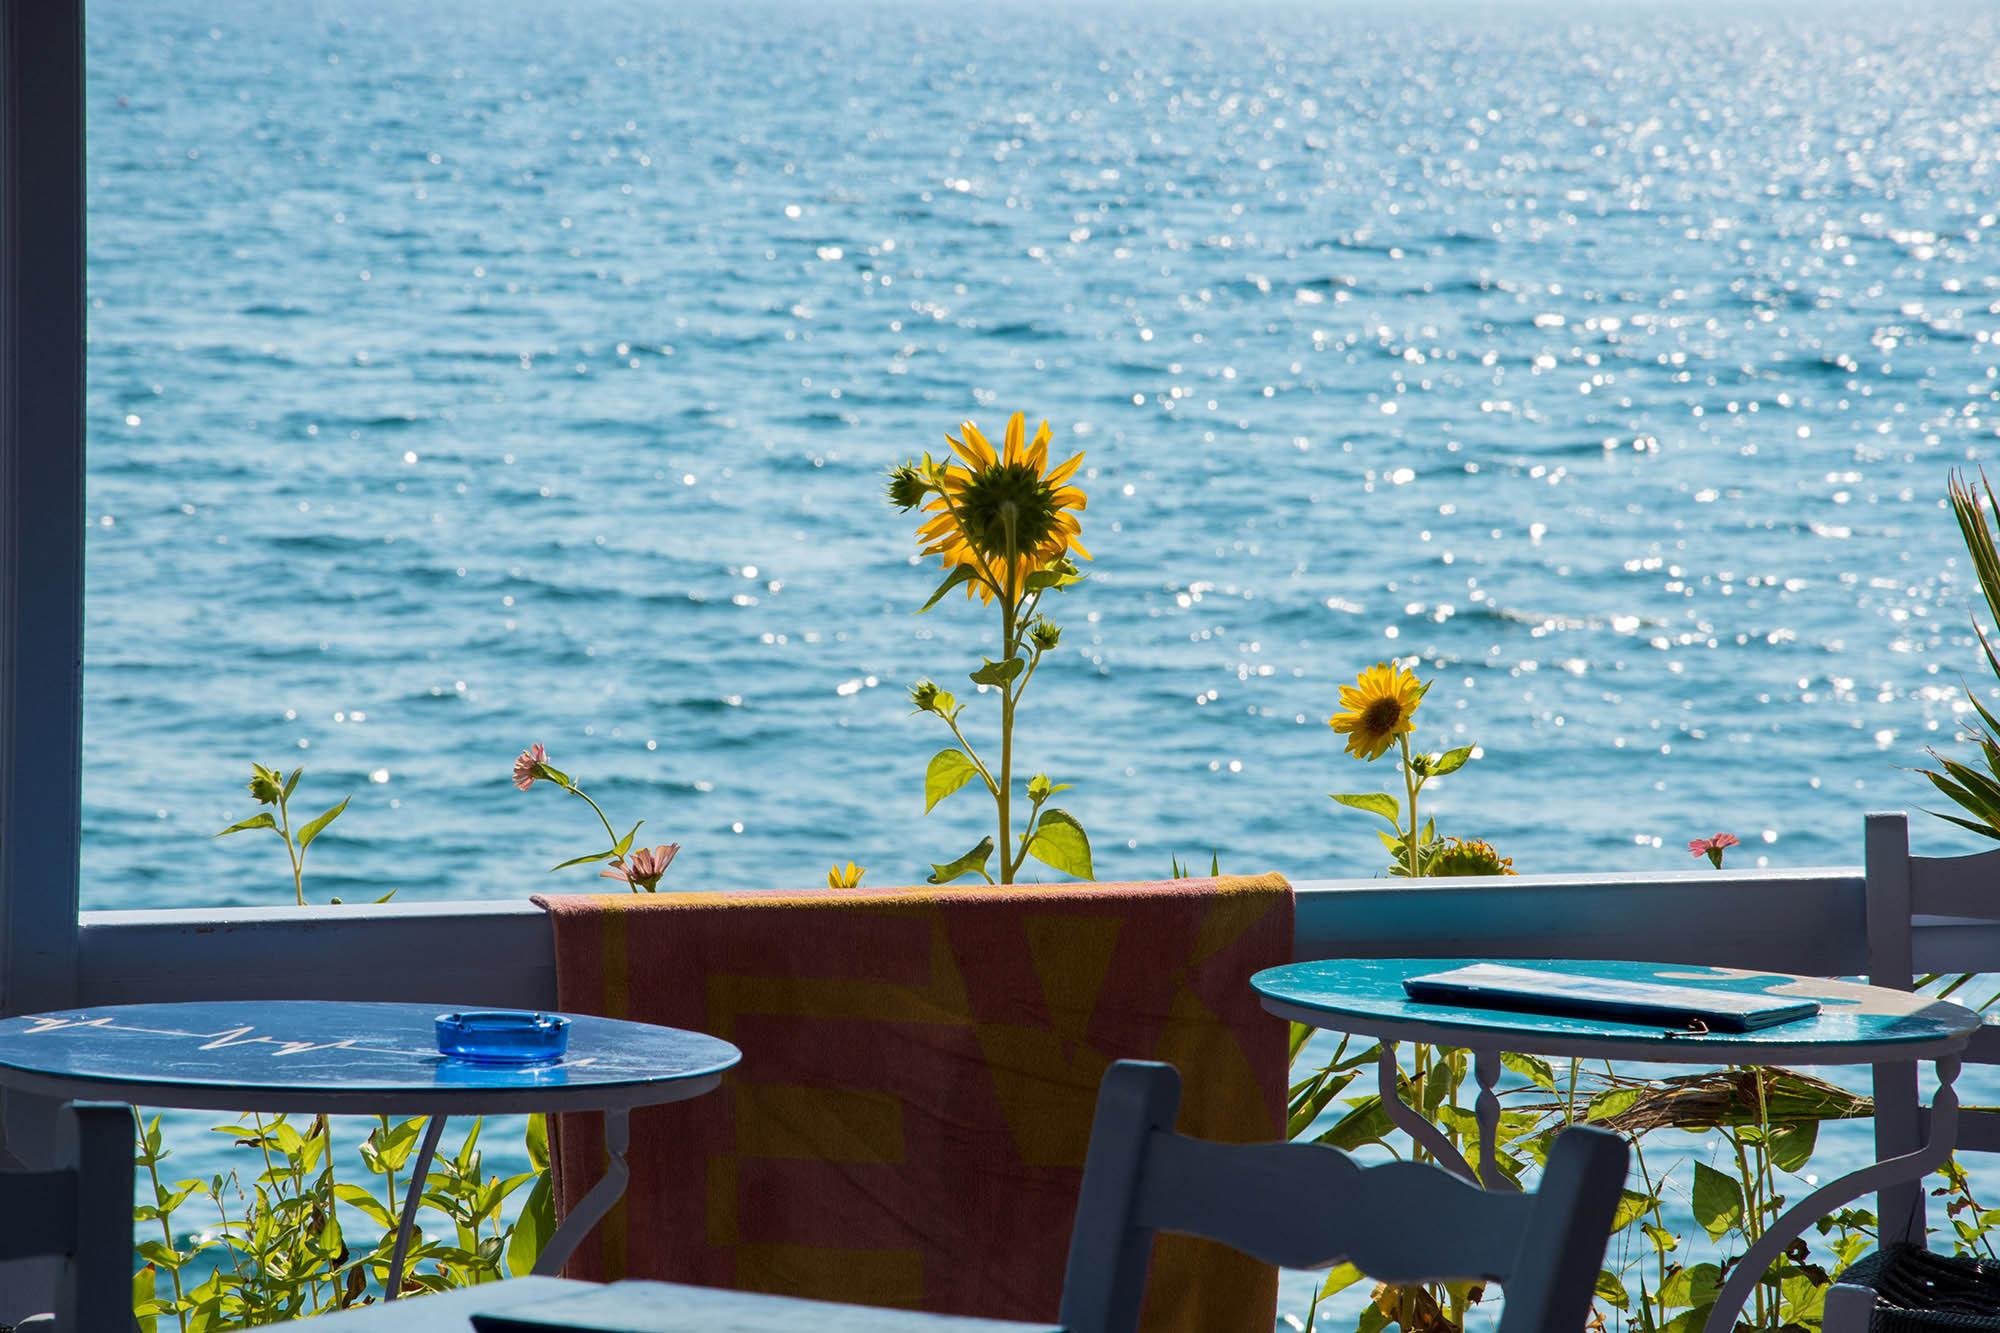 milelja serenity cafe view